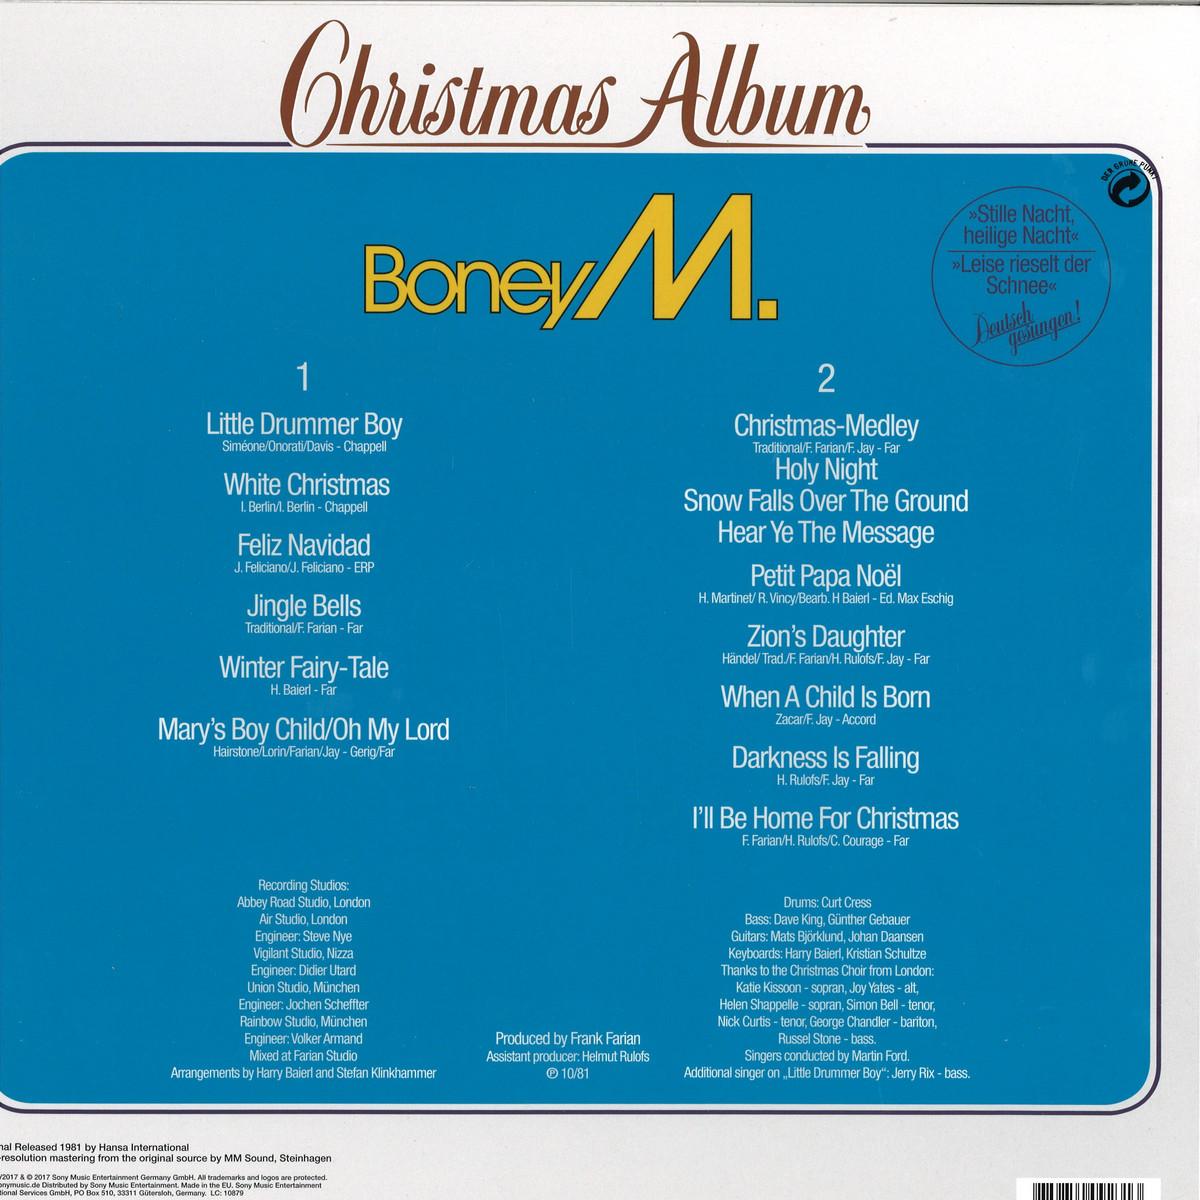 Boney M Christmas Album.Boney M